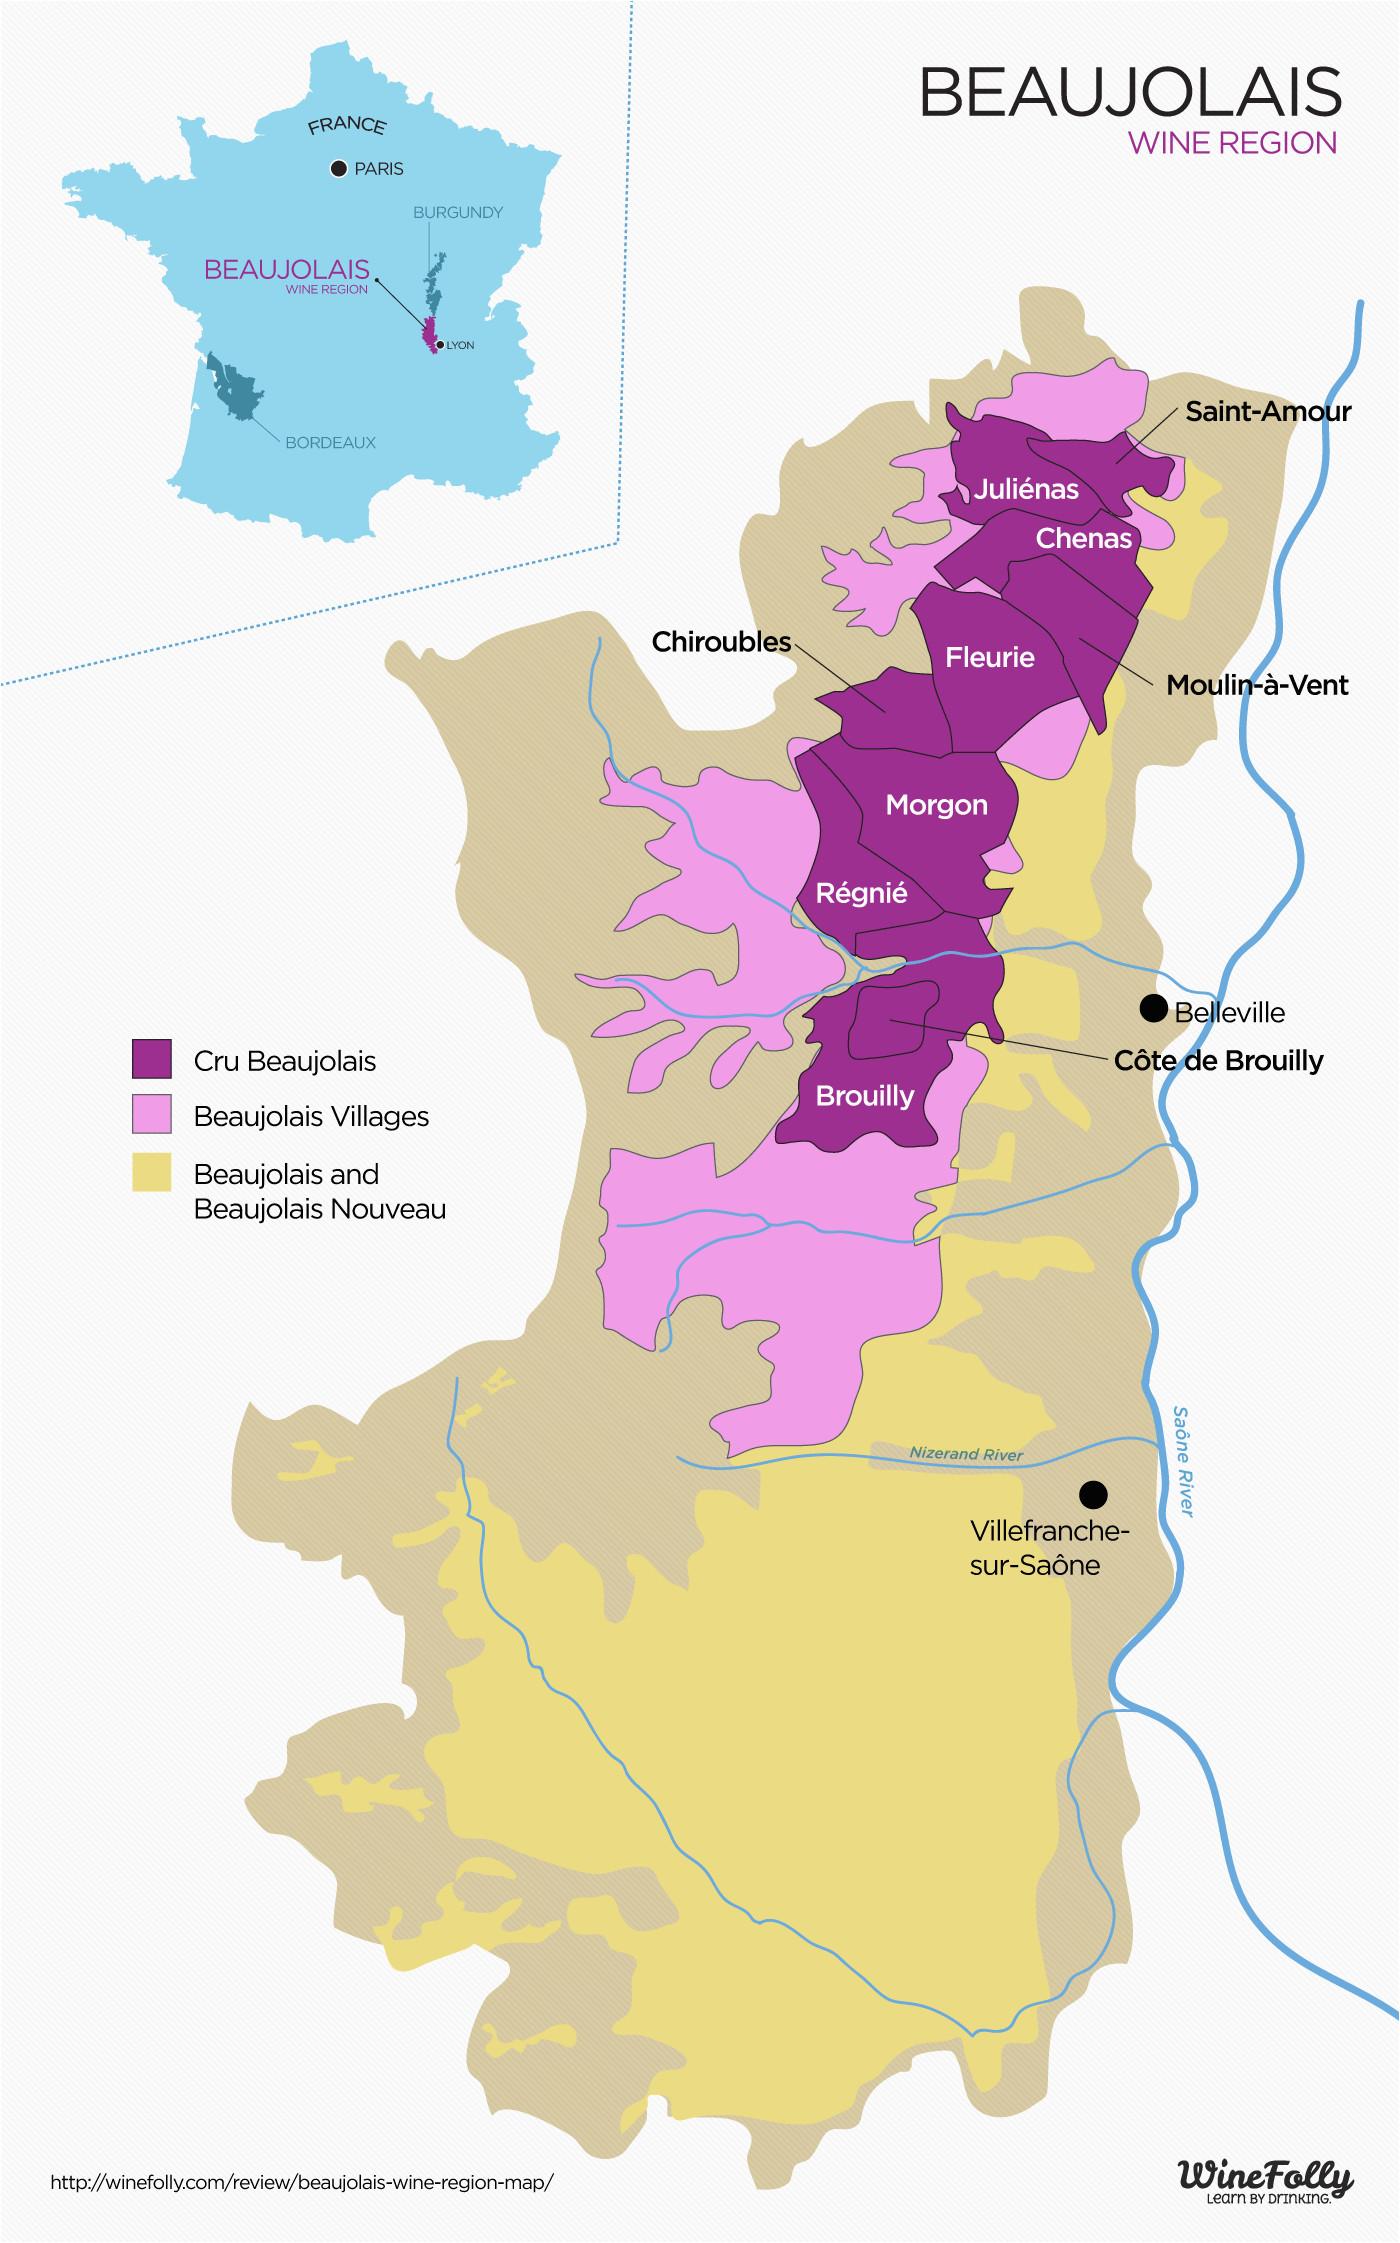 Oregon Vineyards Map the Secret to Finding Good Beaujolais Wine Vine Wonderful France